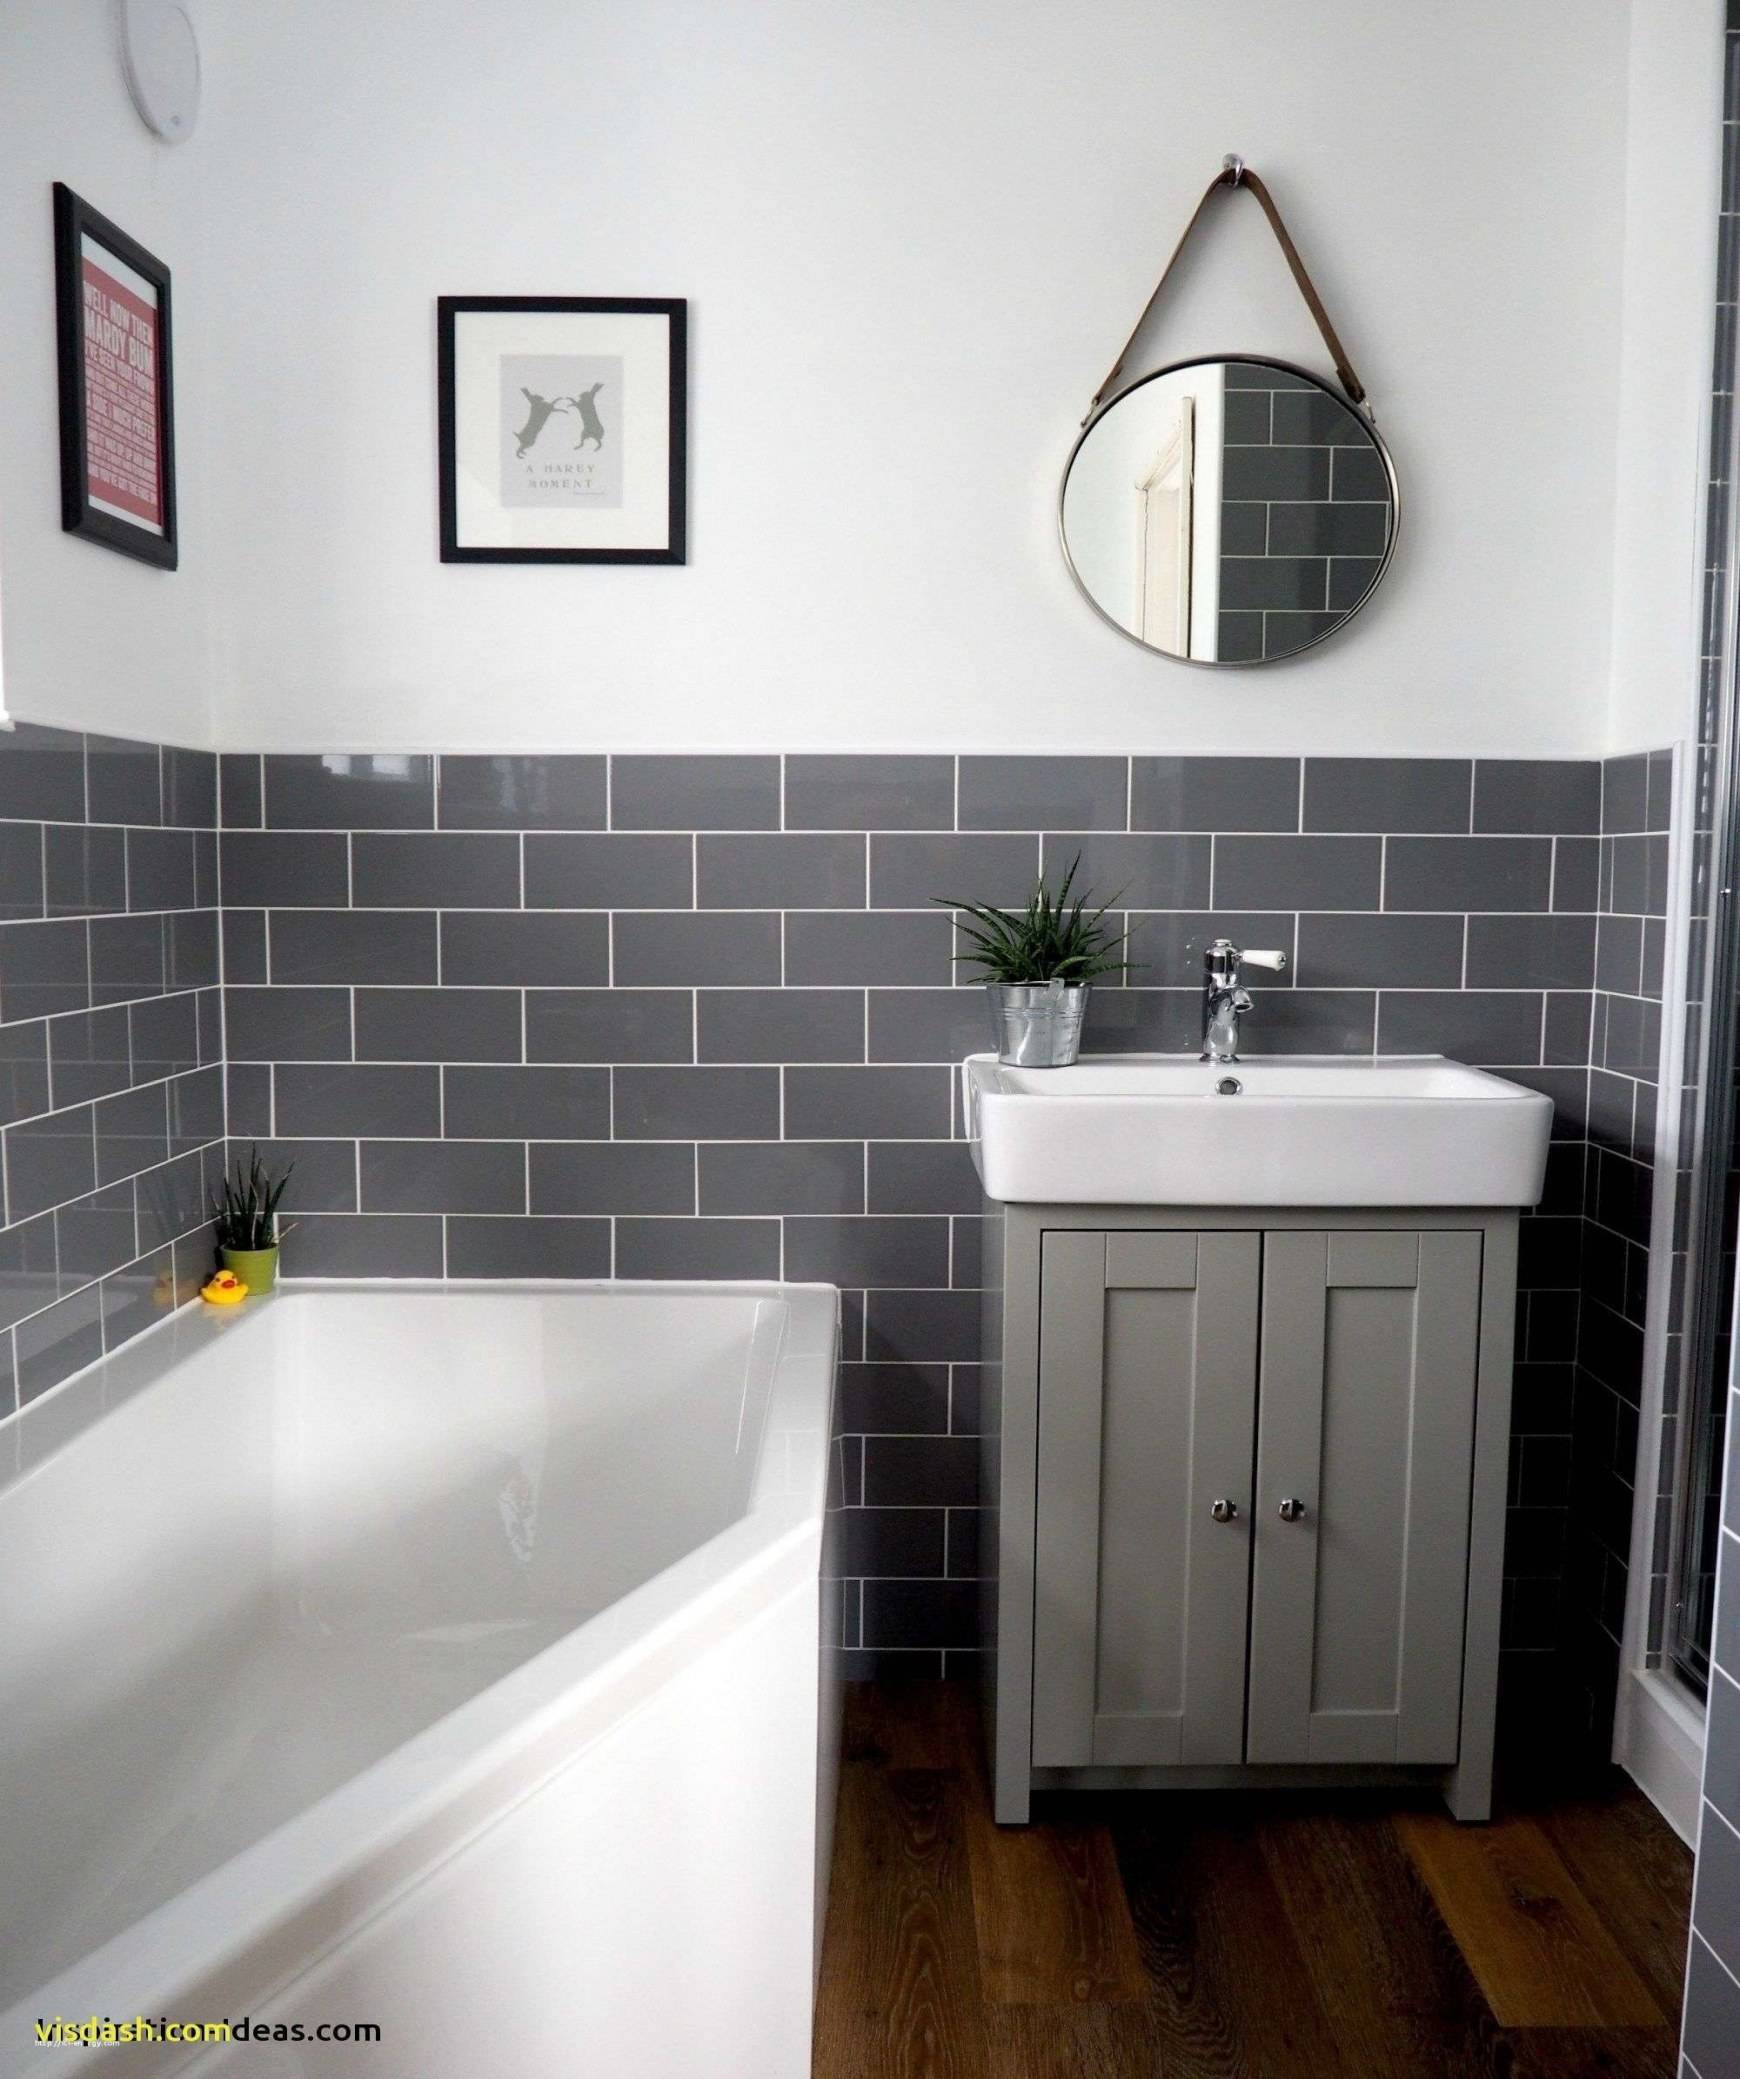 bathroom tiles design home ideas shower tile ideas astonishing best small of bathroom tiles design